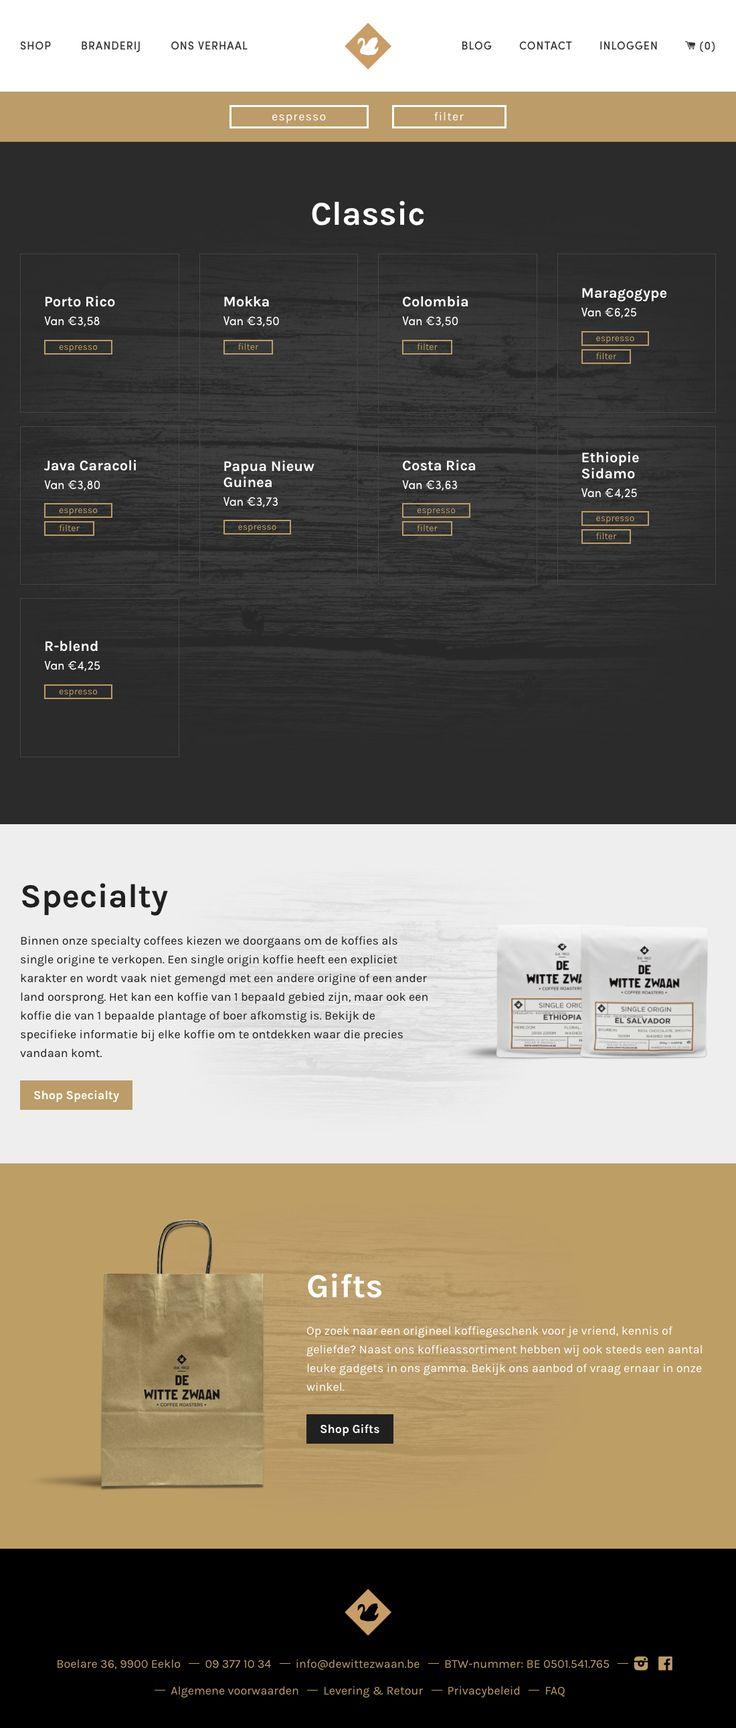 De Witte Zwaan - Webshop - Webdesign by Esign